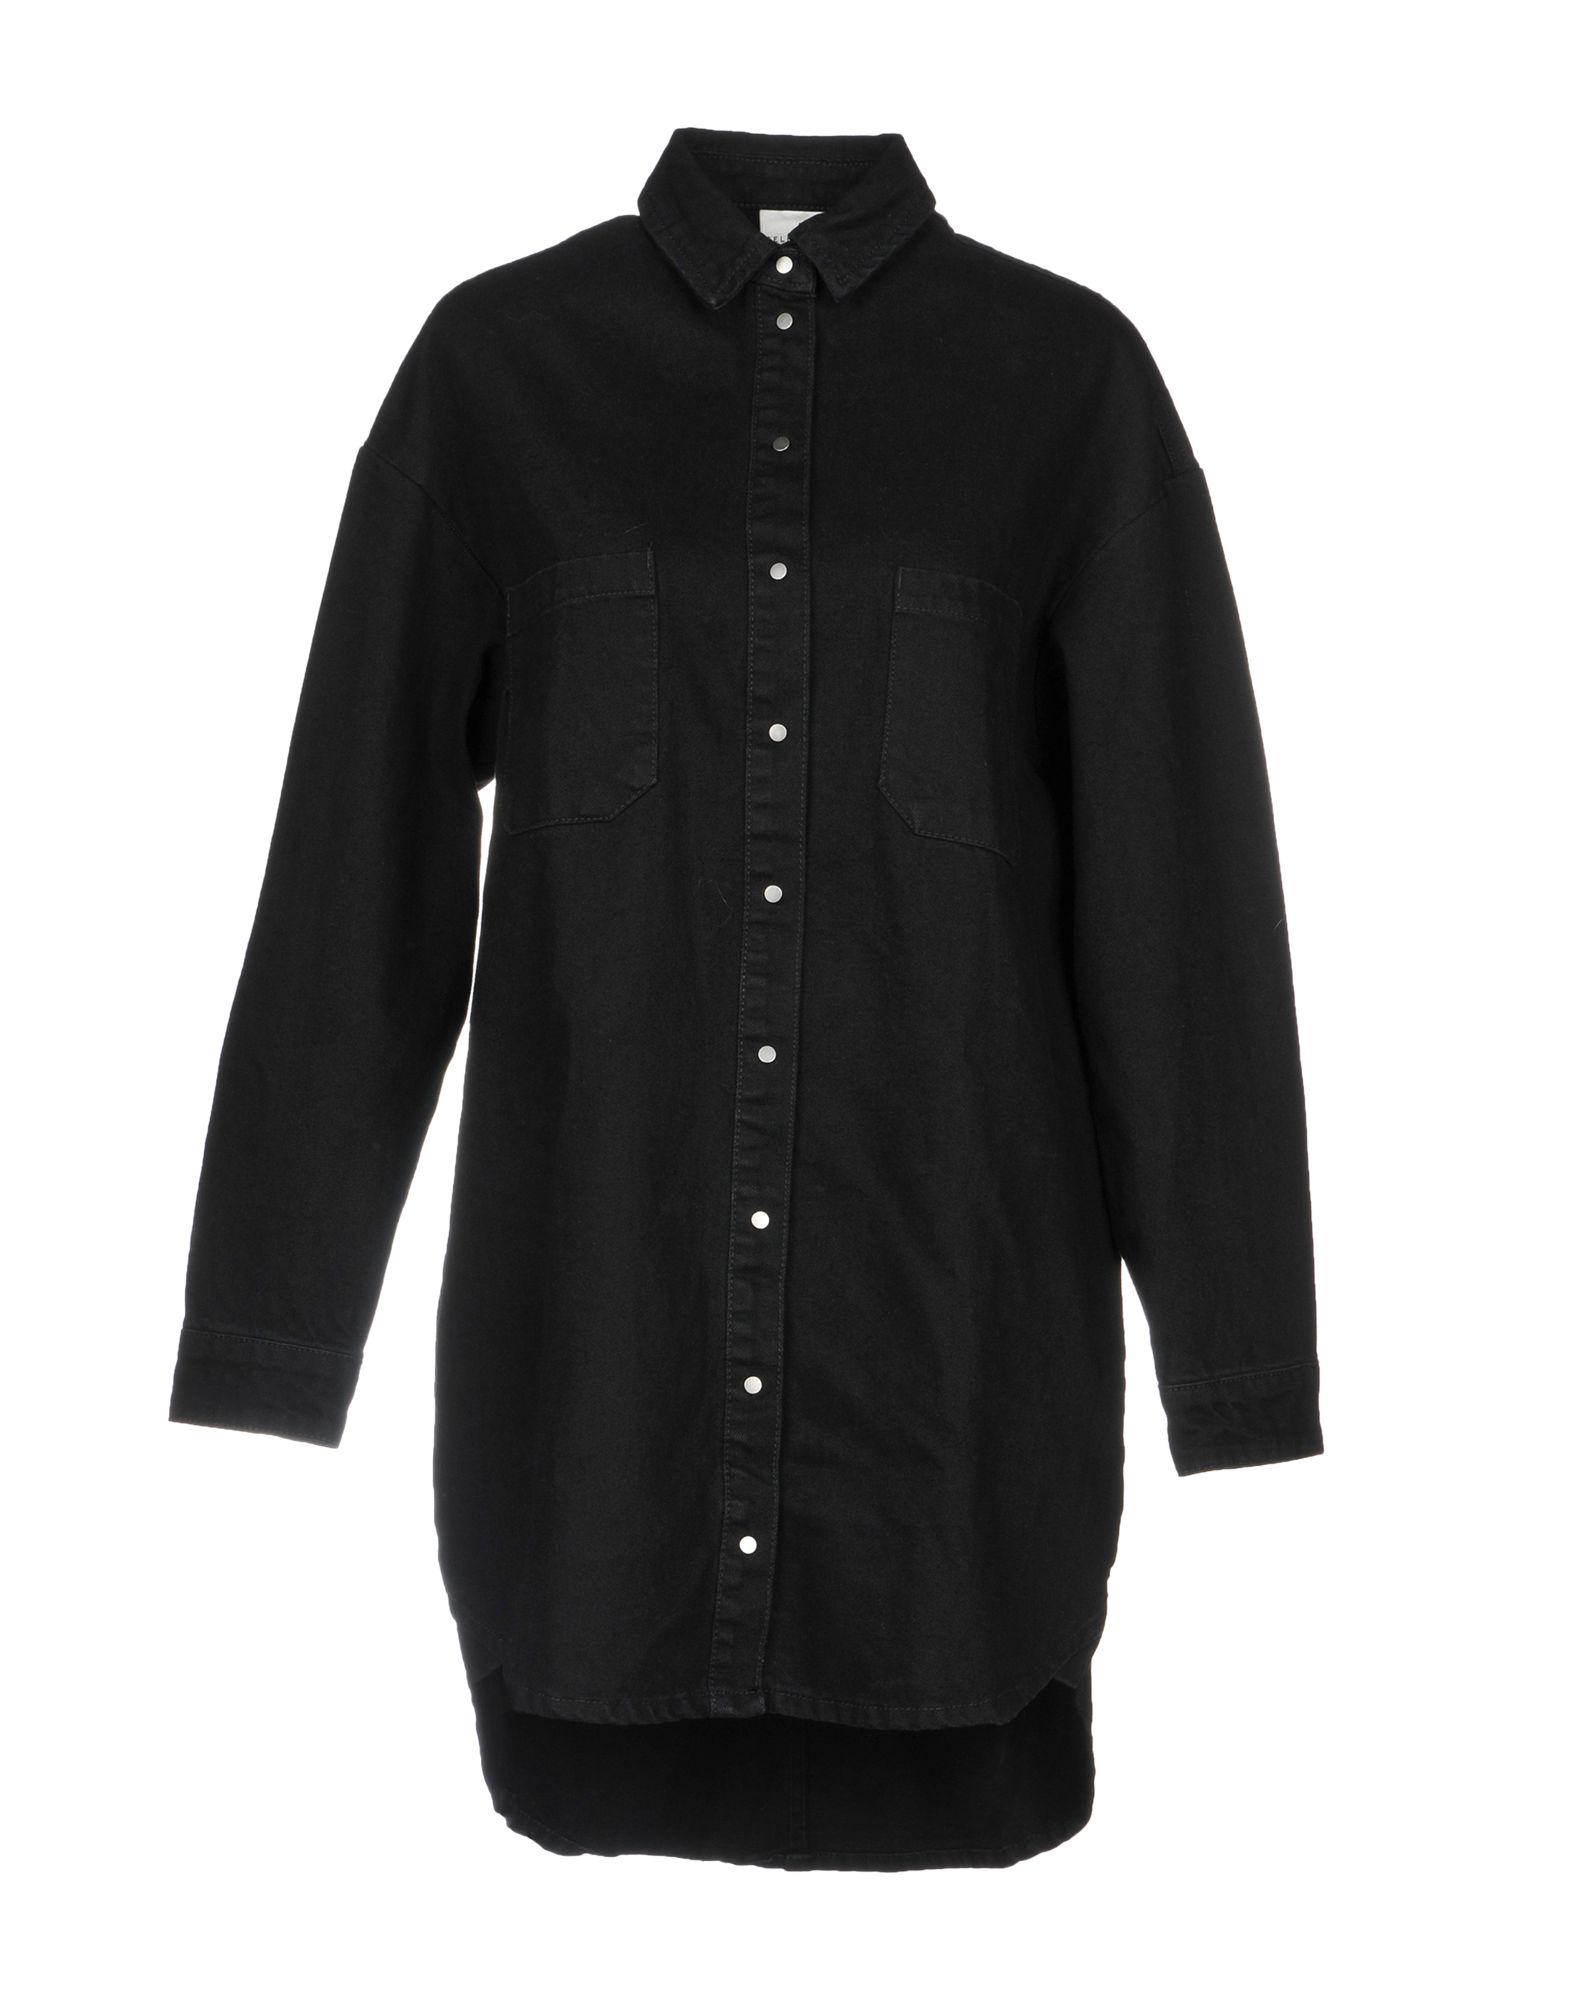 SELECTED FEMME Джинсовая рубашка рубашка женская selected femme цвет молочный 16052017 размер 40 46